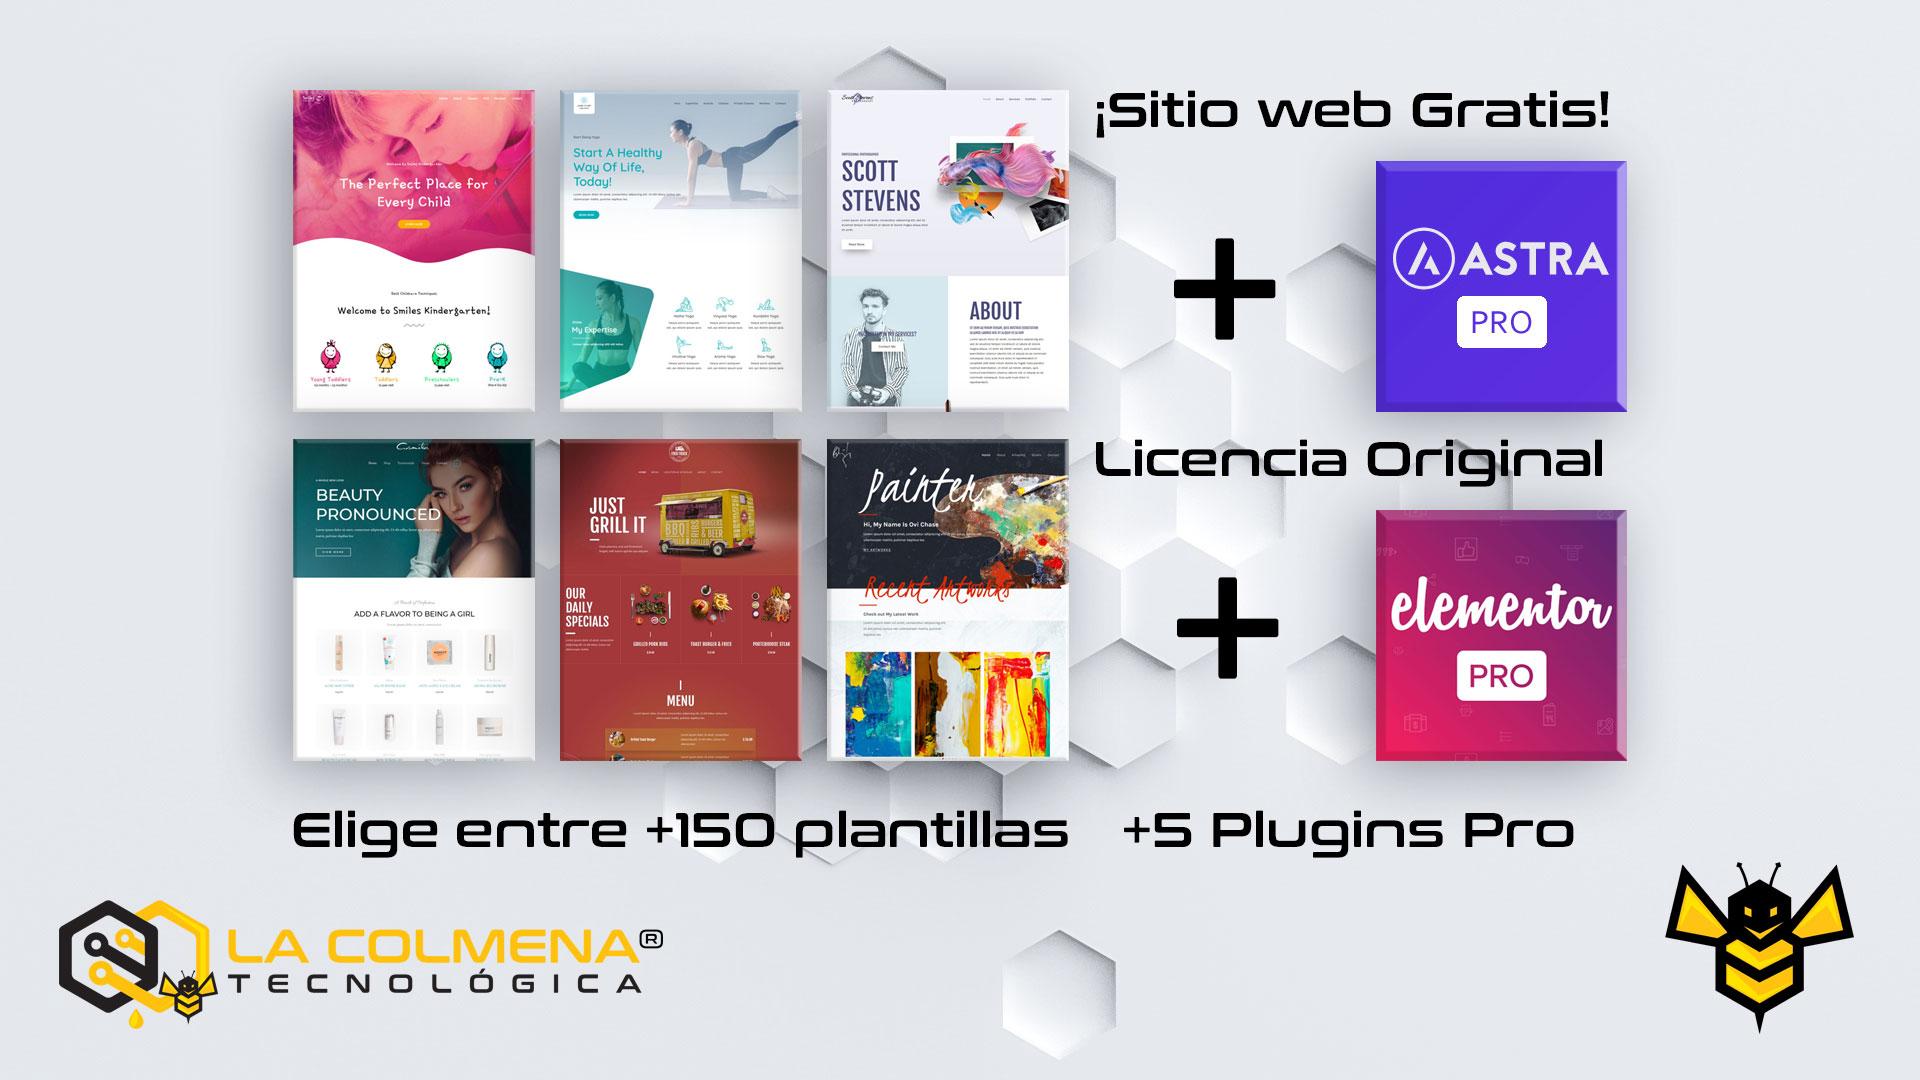 Página web Gratis + Astra Pro + Elementor Pro